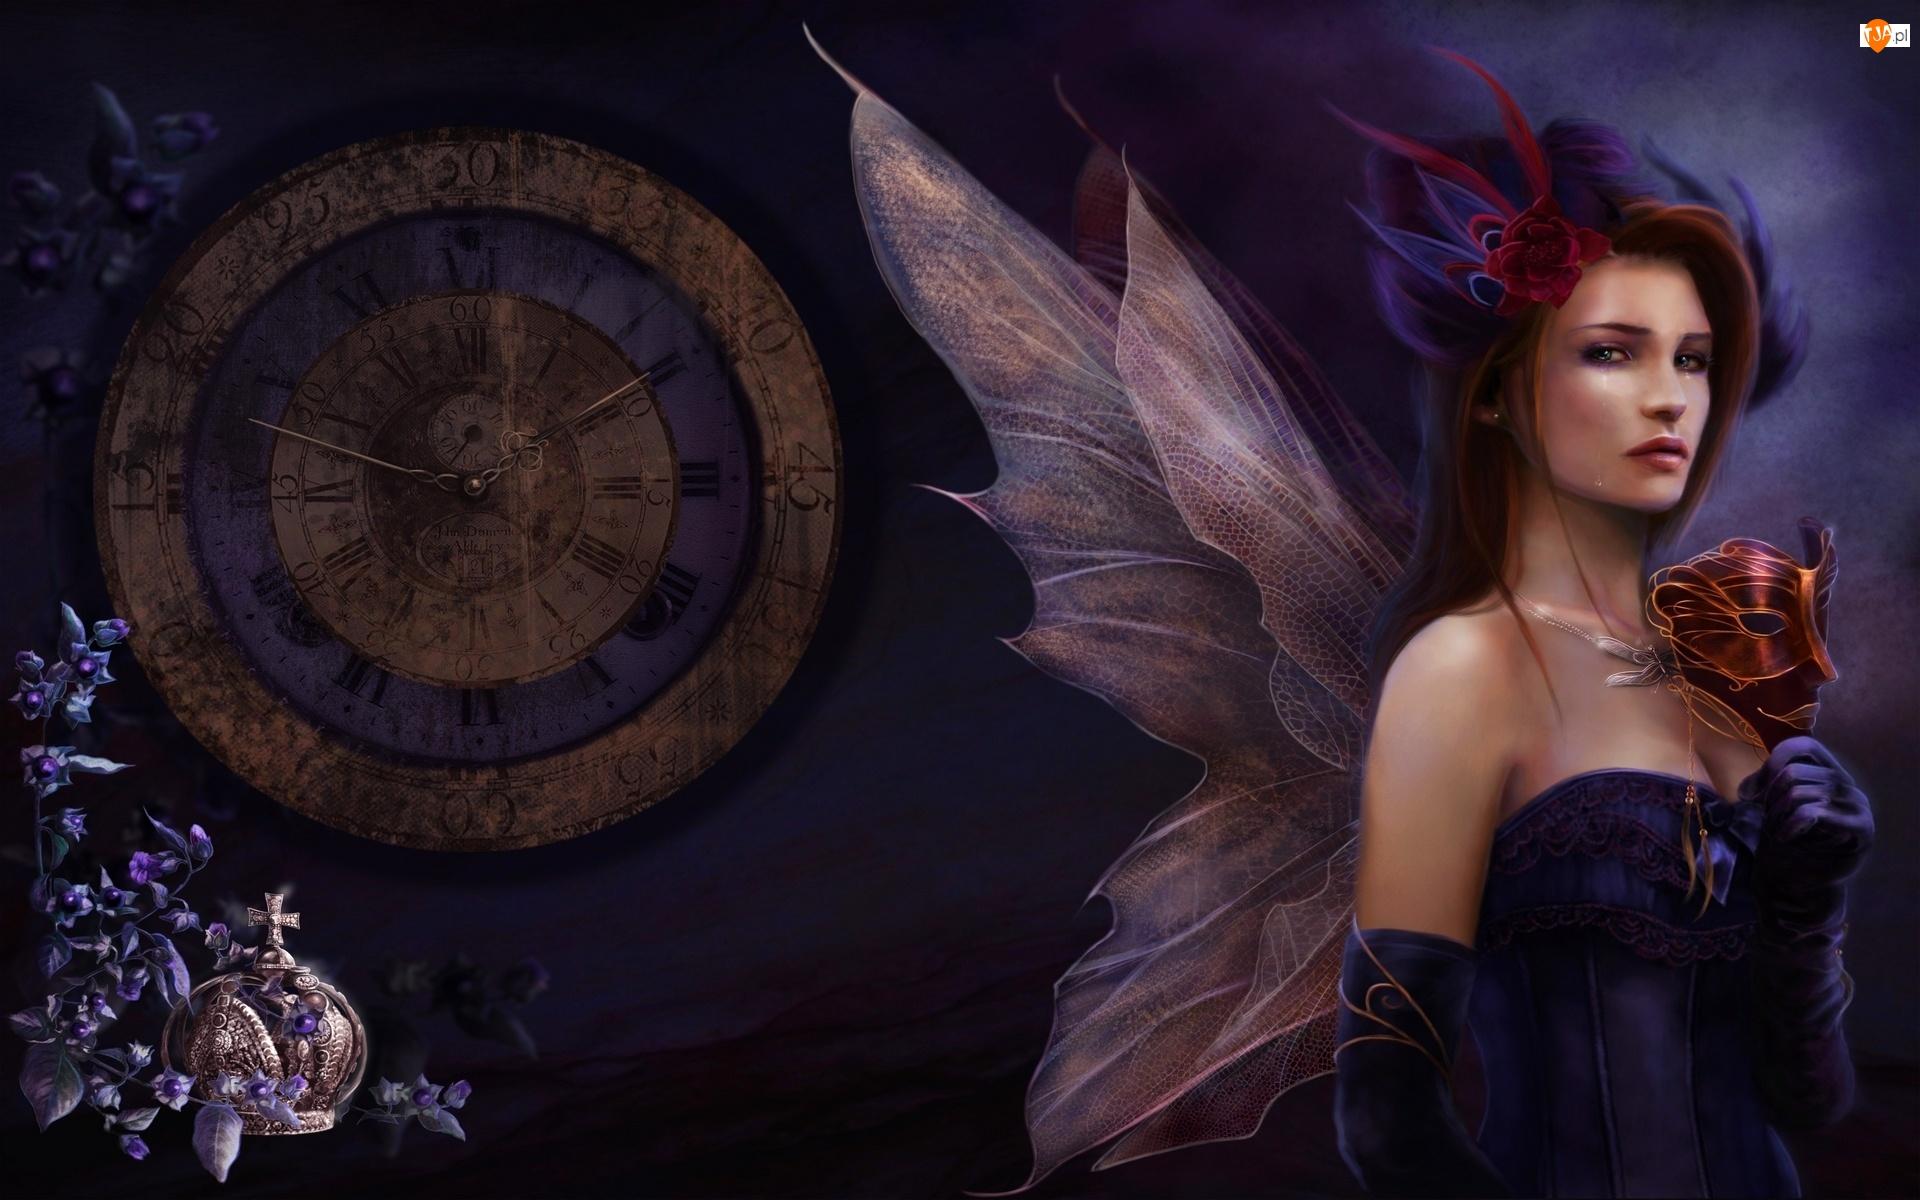 Kobieta, Zegar, Motyl, Maska